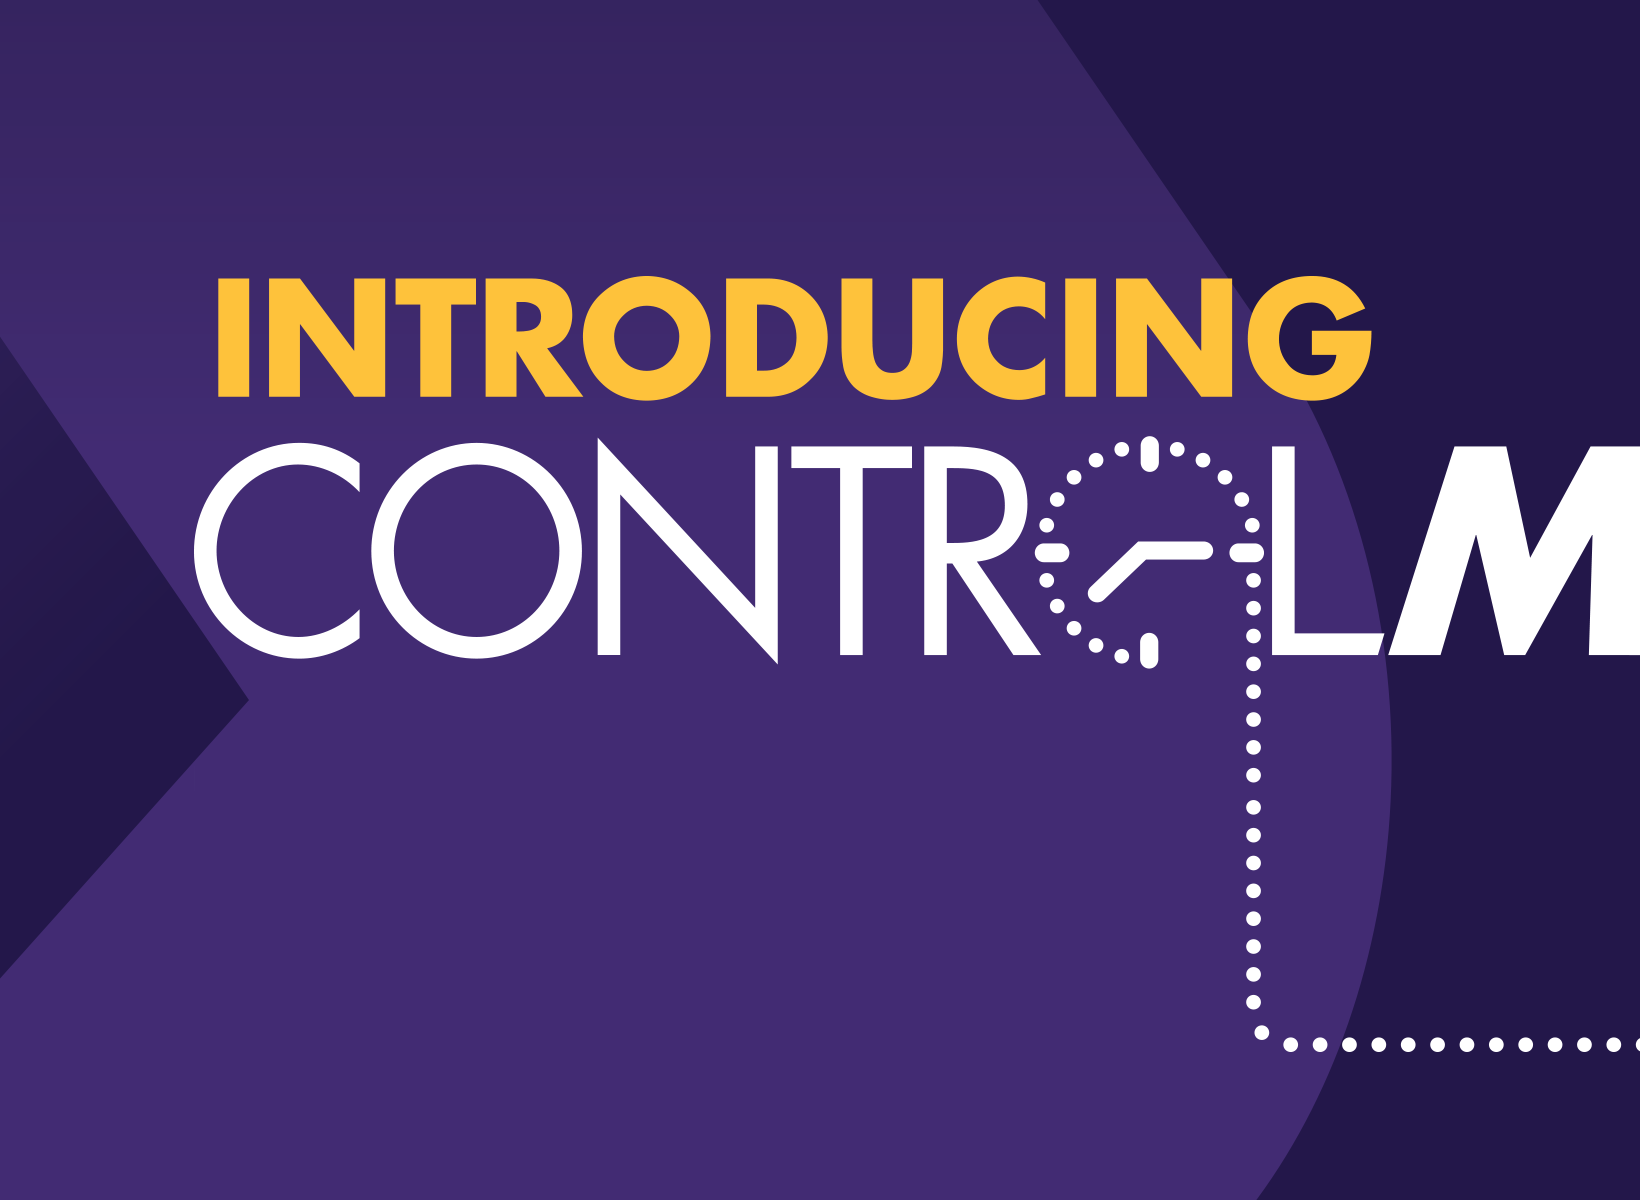 ControlMAX for Keyfuels